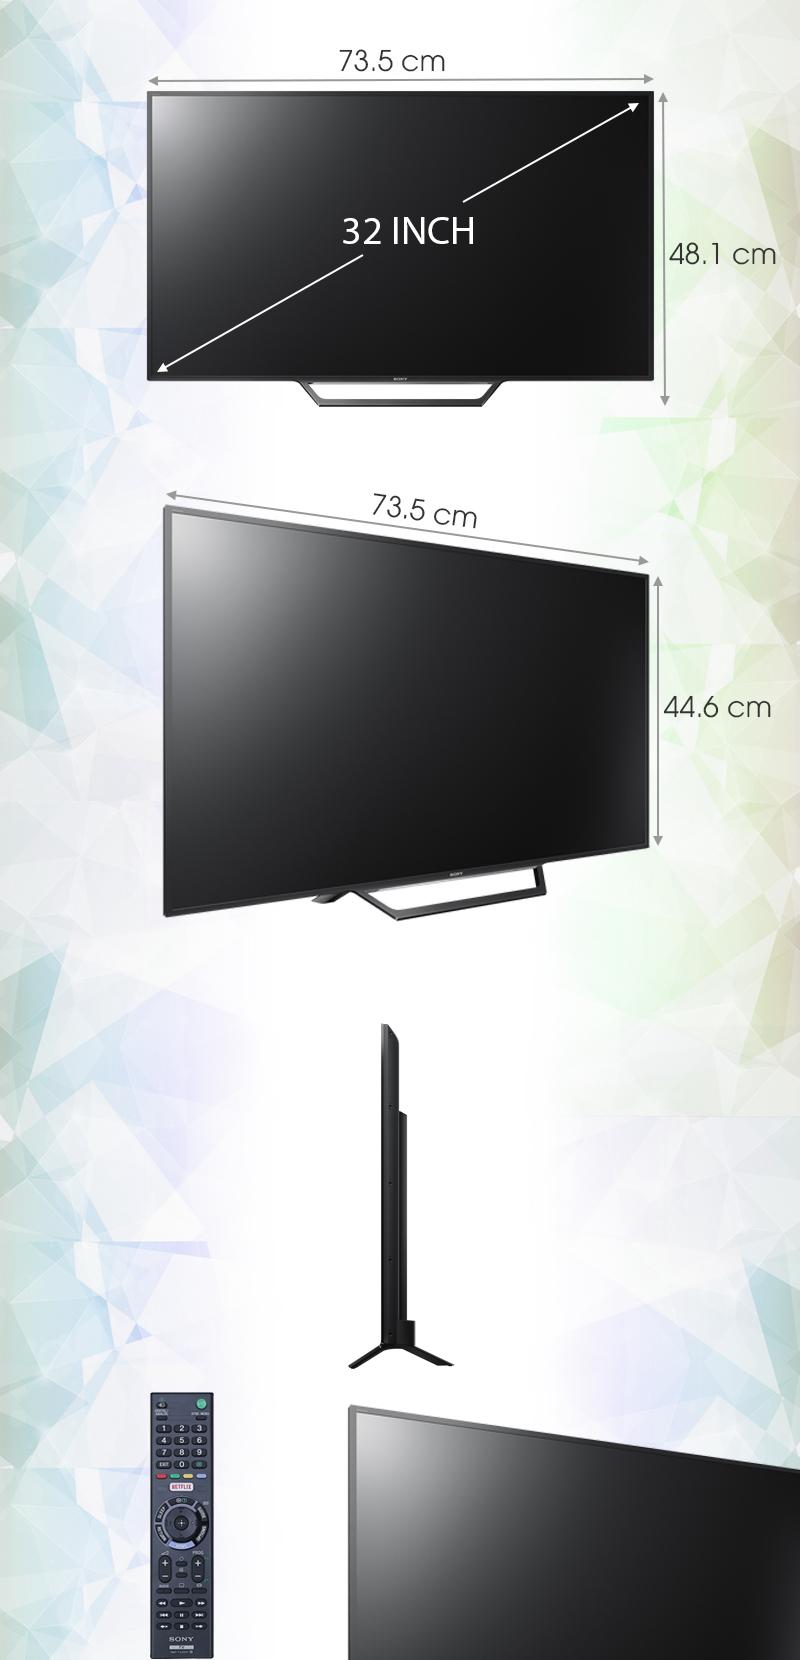 Internet Tivi Sony 32 inch KDL-32W600D - Kích thước tivi